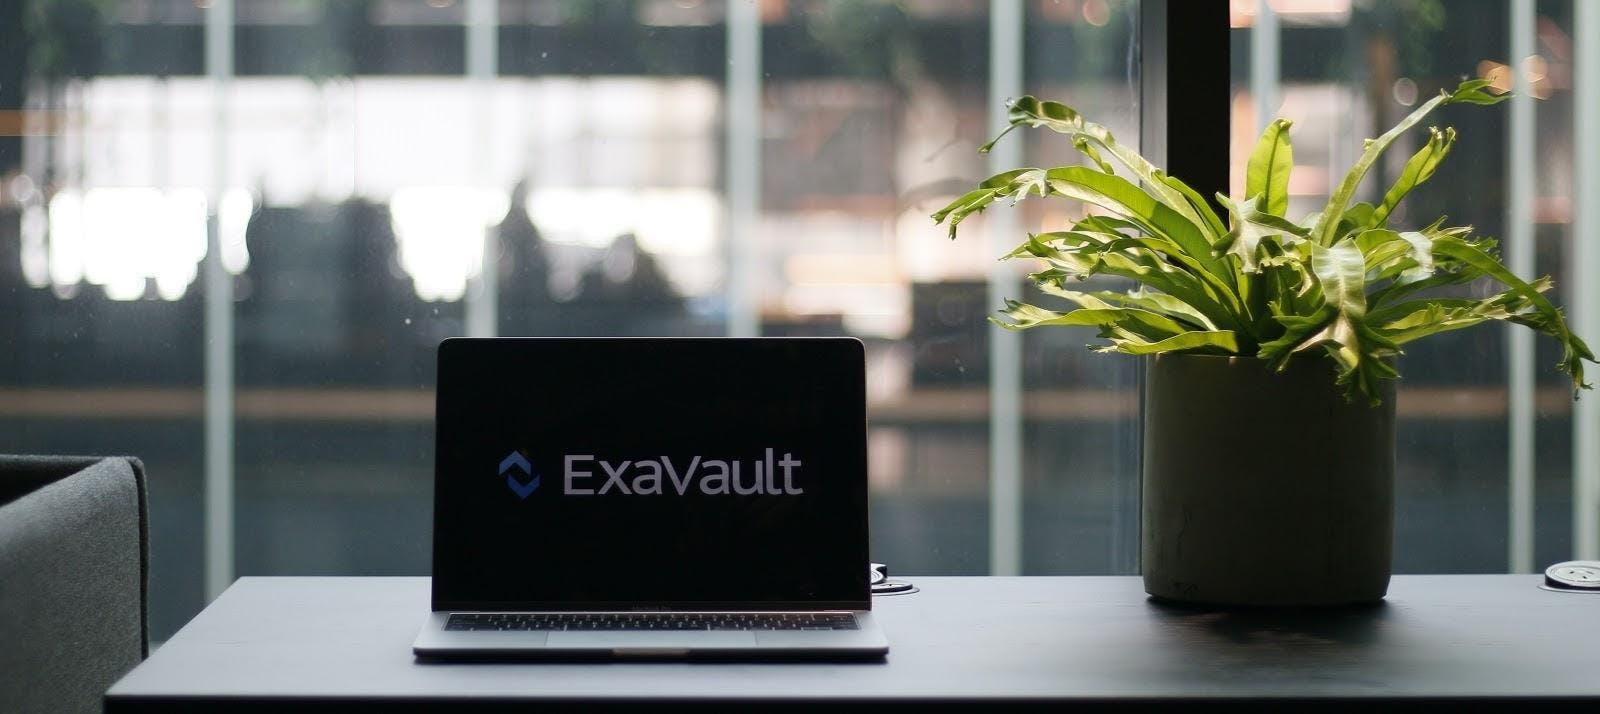 ExaVault logo on computer screen.